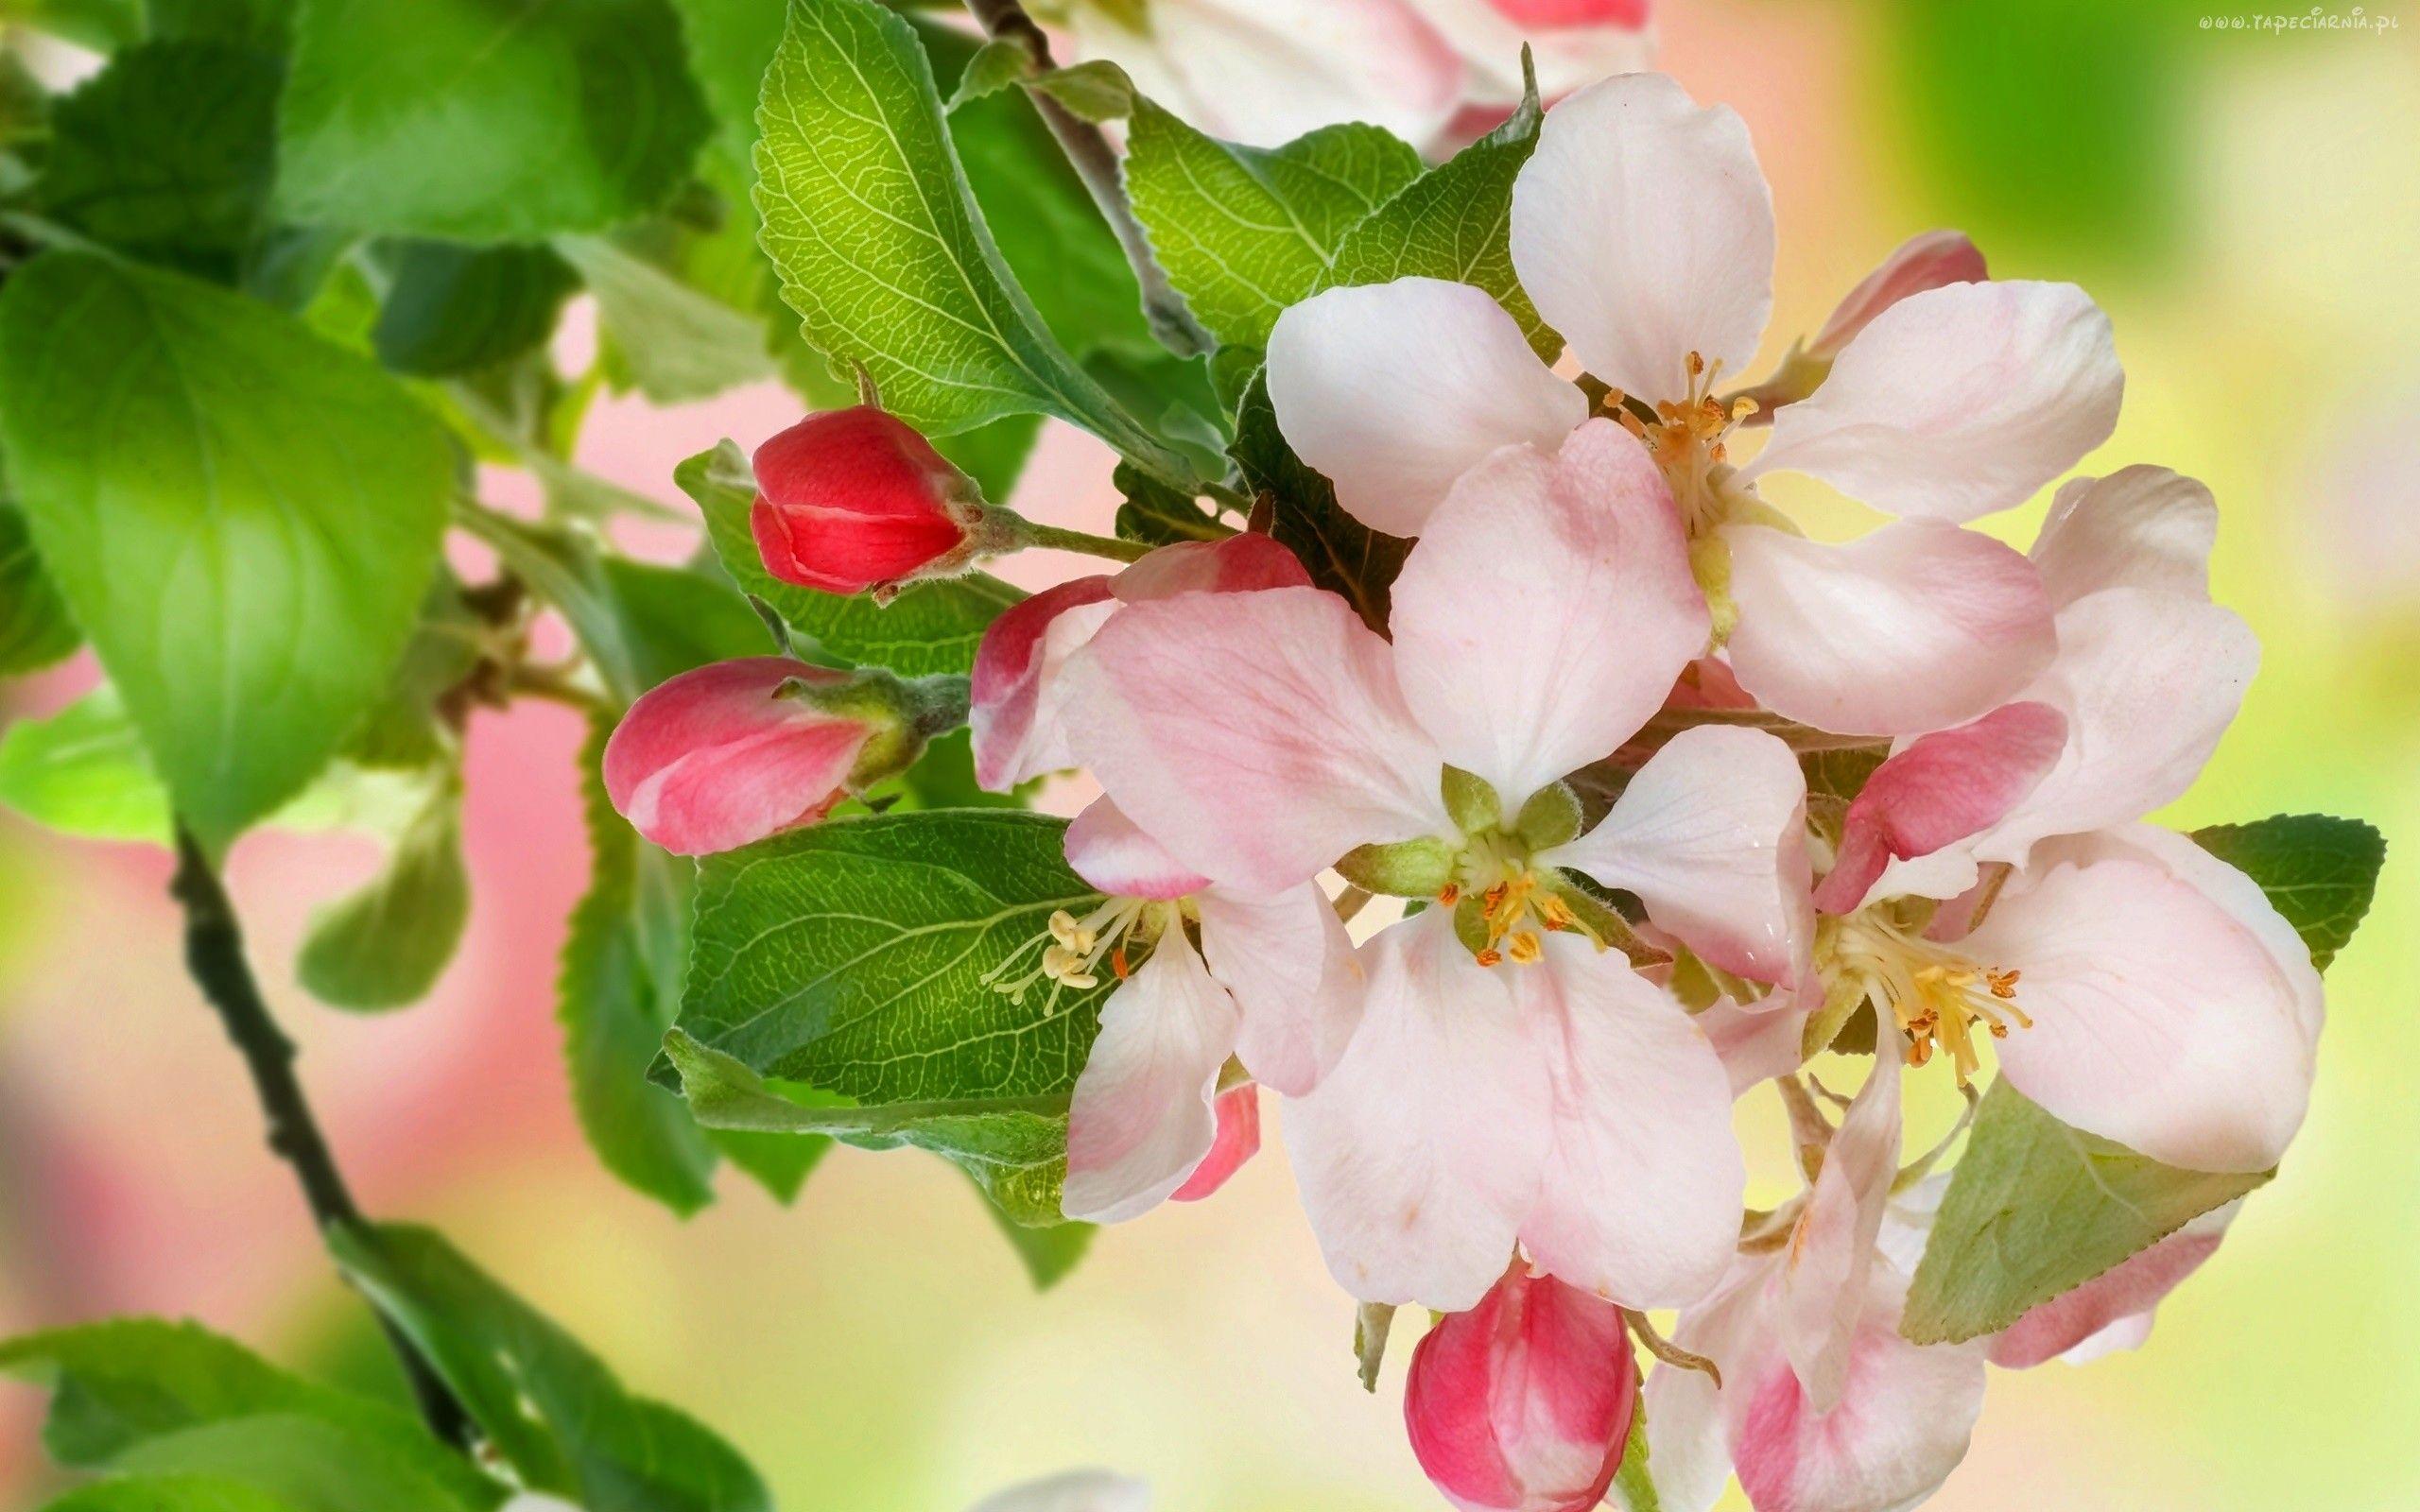 Wiosna Kwiaty Drzewo Owocowe Jablon Cherry Blossom Images Apple Tree Blossoms Spring Flowers